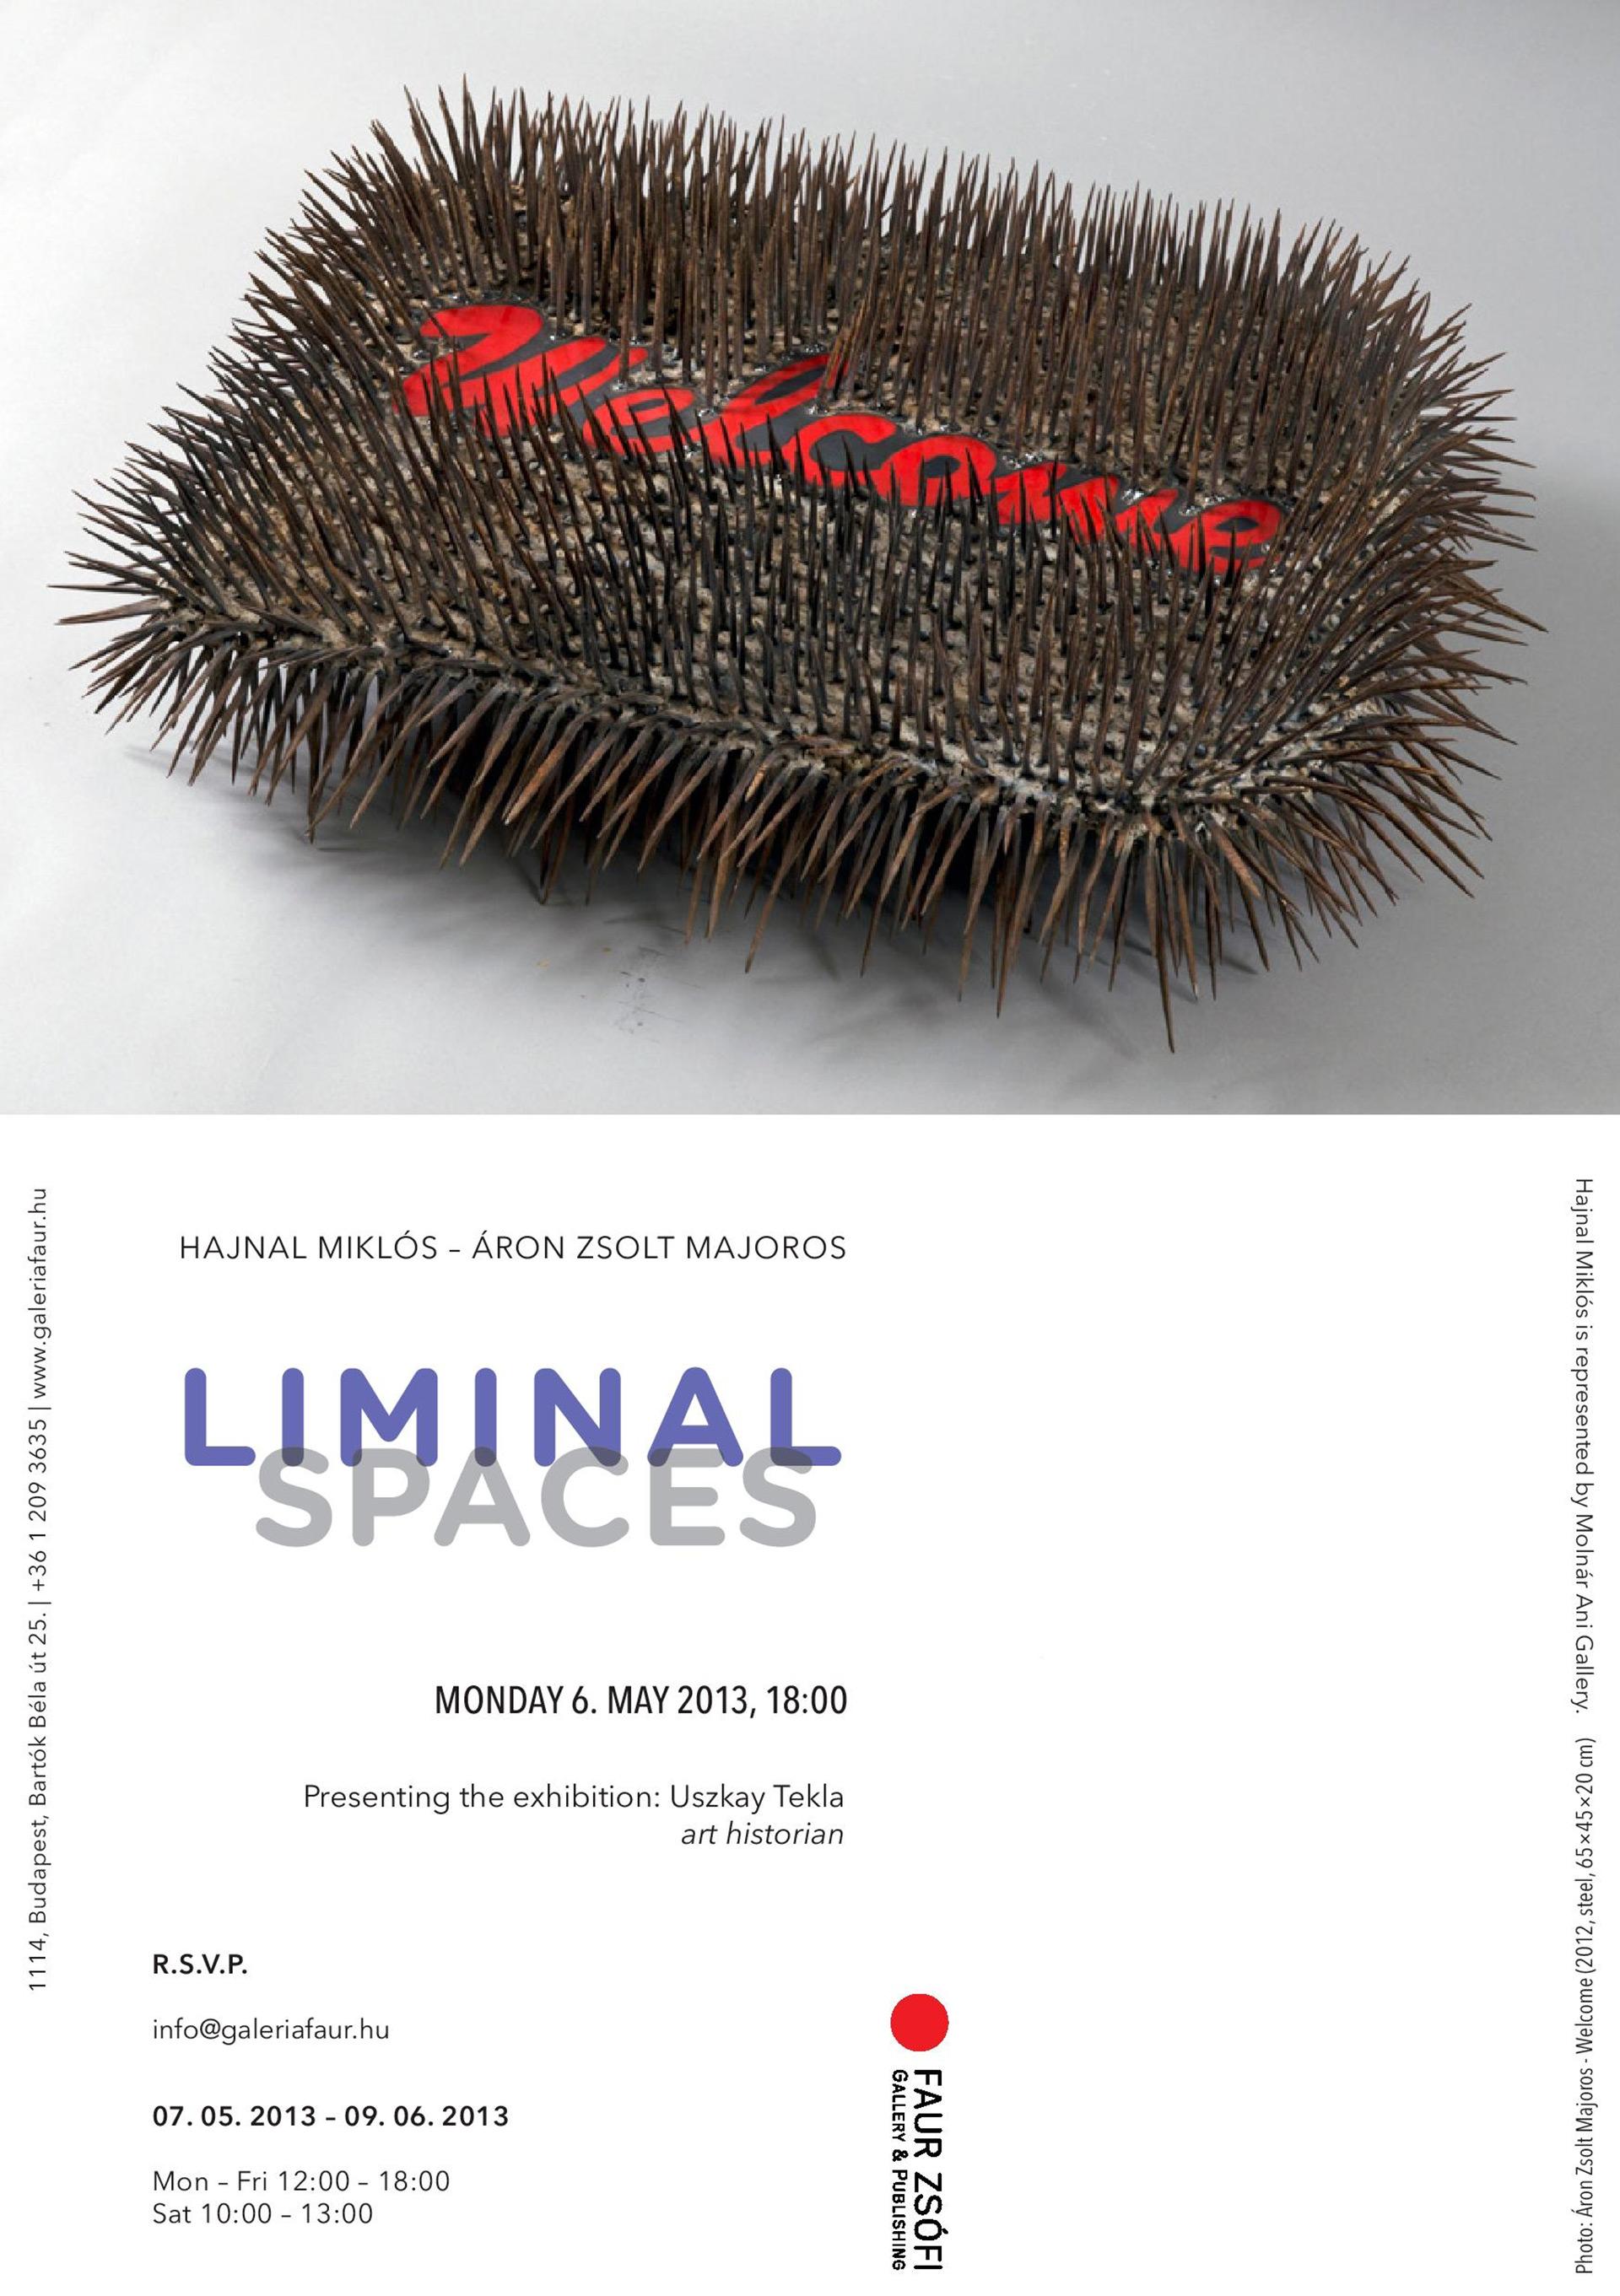 006-liminal_spaces